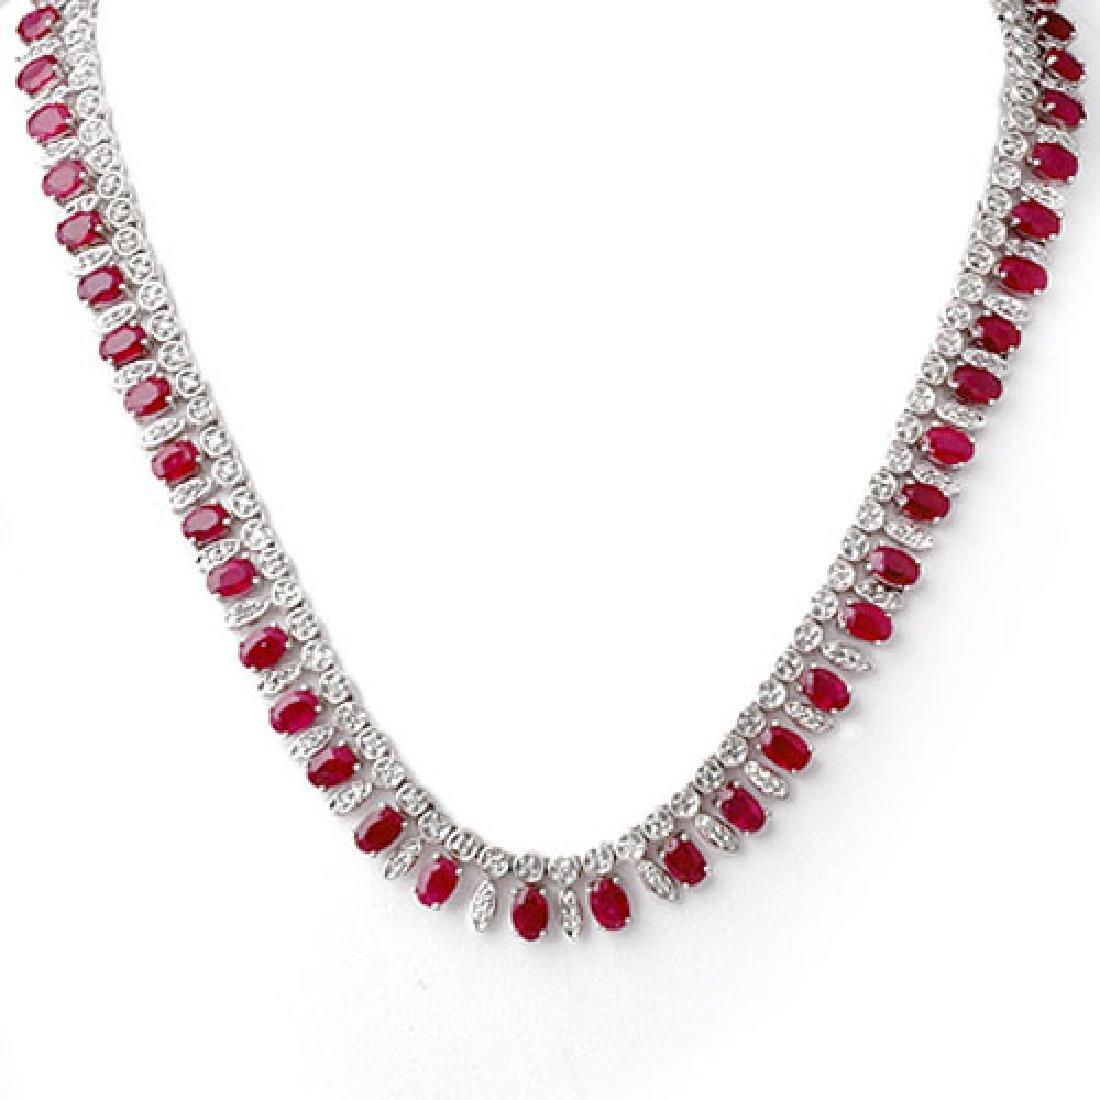 26 CTW Ruby & Diamond Necklace 18K White Gold